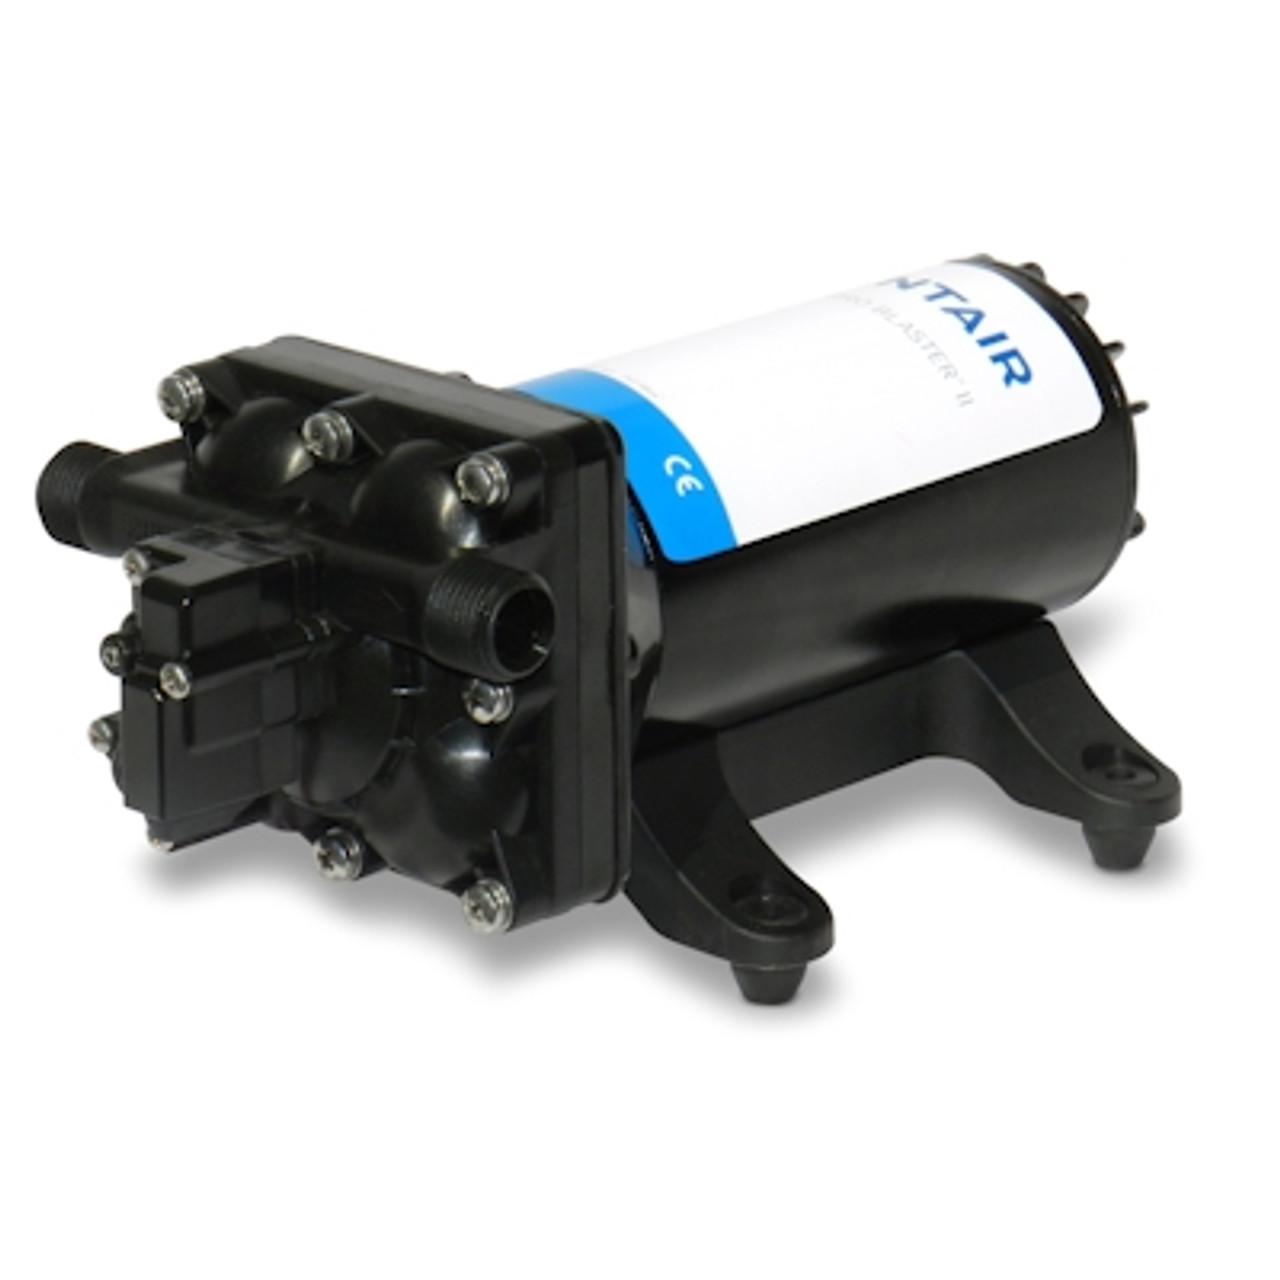 "Shurflo 4248-163-E09 ""Pro-Blaster II"" Automatic 24v DC Pump (Santoprene/EPDM) 15.1 L/Min Max 60 psi Max"